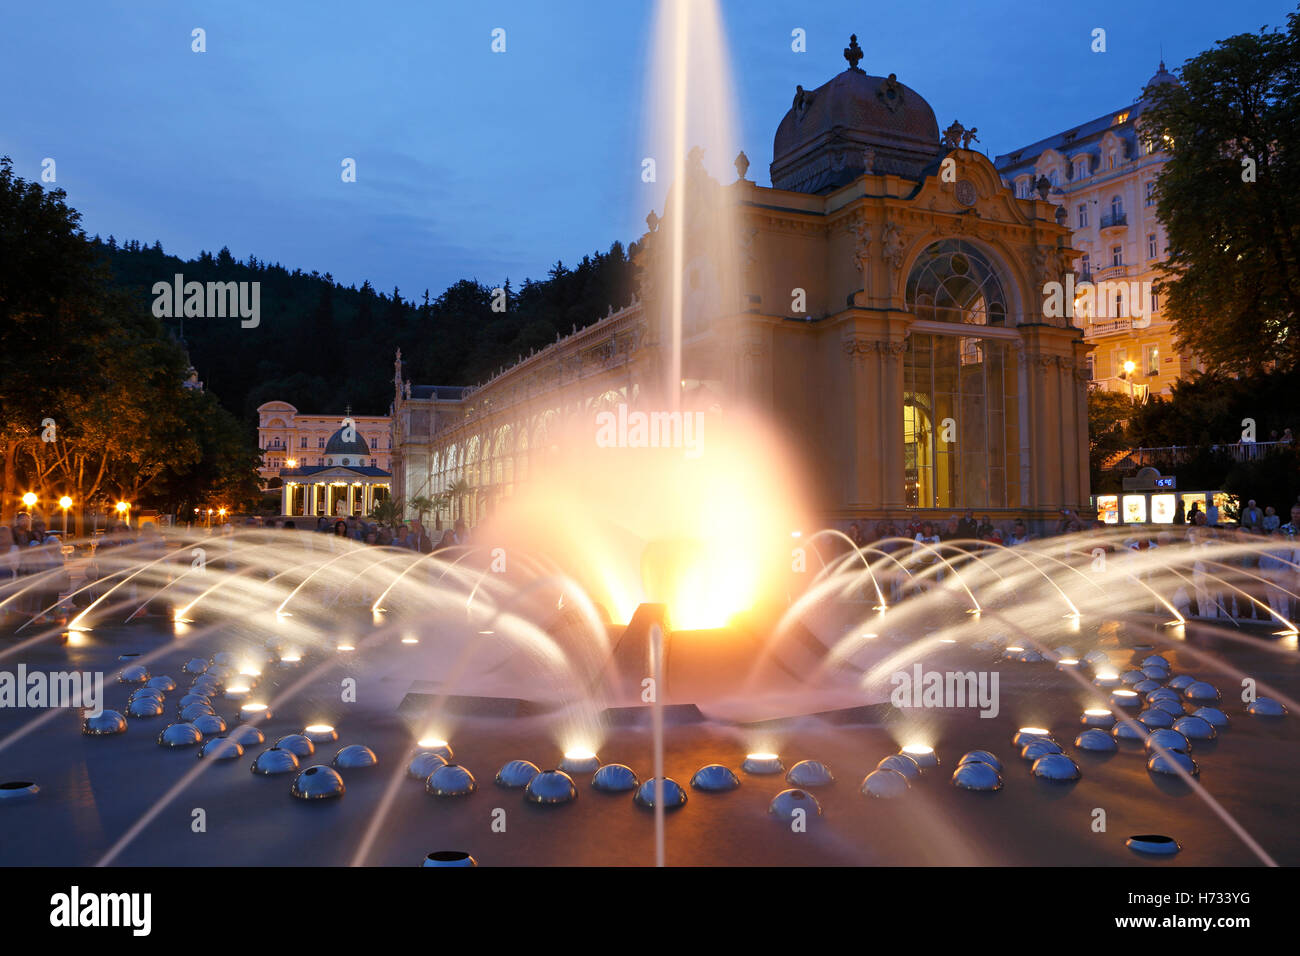 Singing Fountain Marienbad Marianske Lazne spa Czech Republik - Stock Image